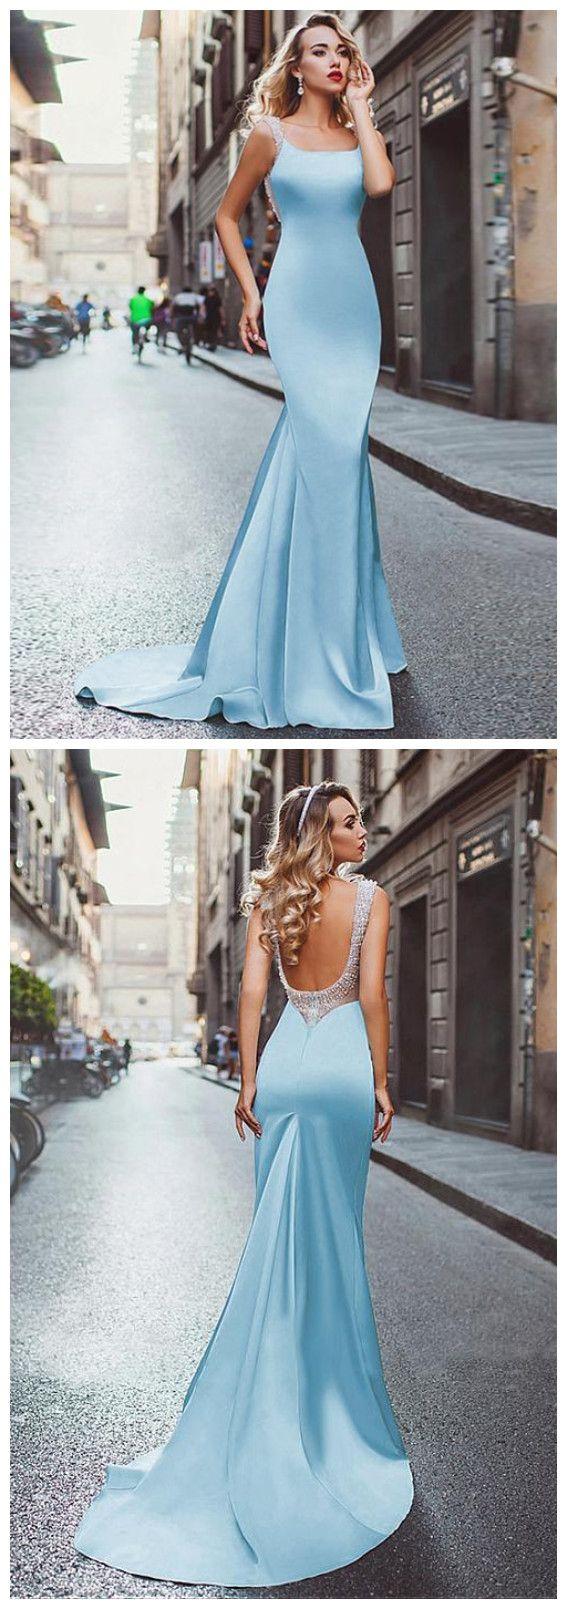 Chic Mermaid Prom Dresses Light Sky Blue Straps Modest Long Prom